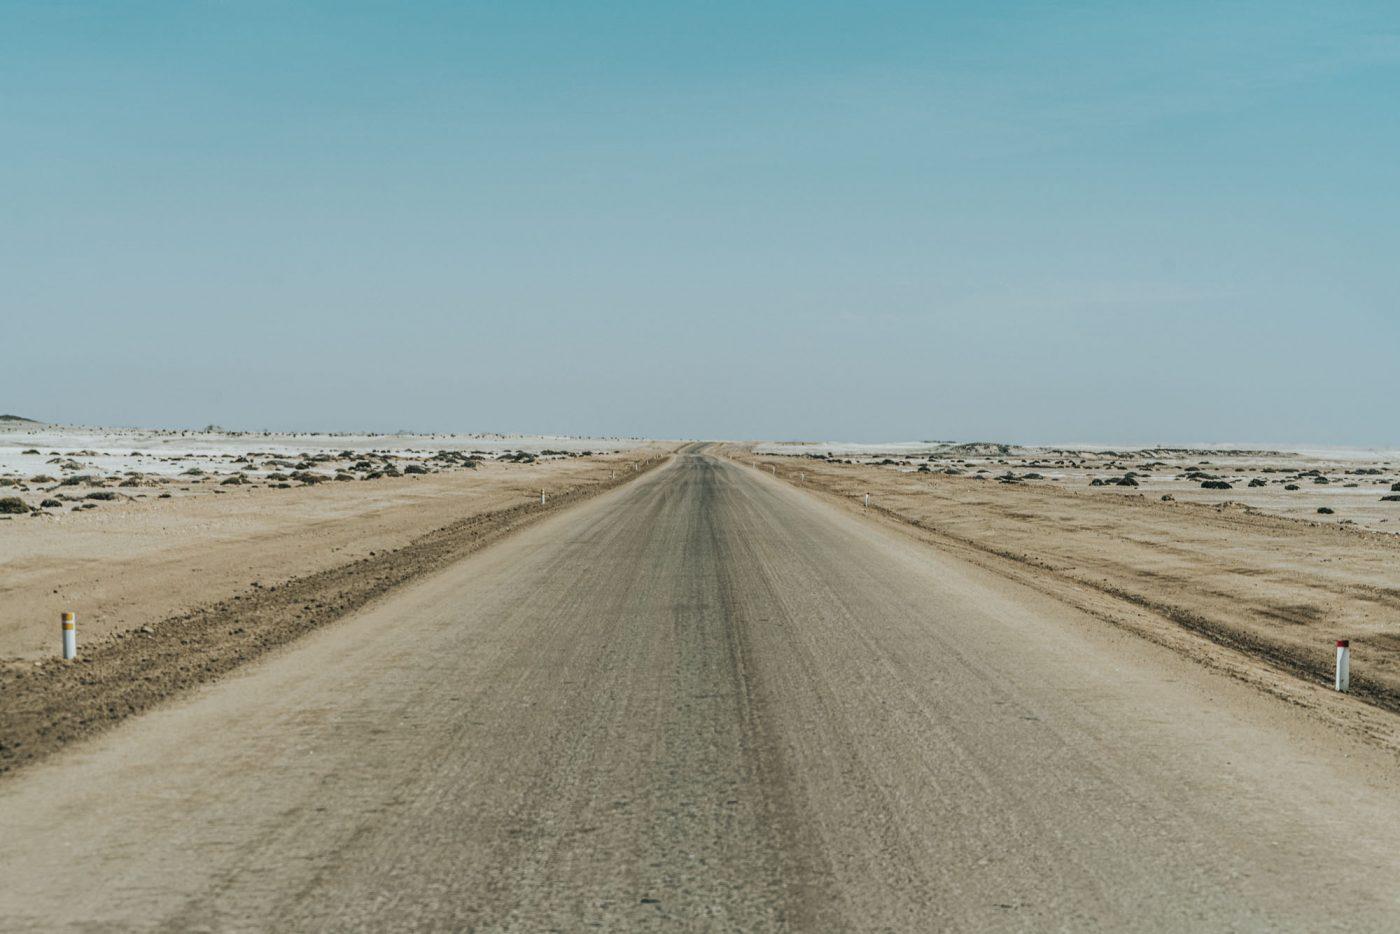 Driving along the Skeleton Coast